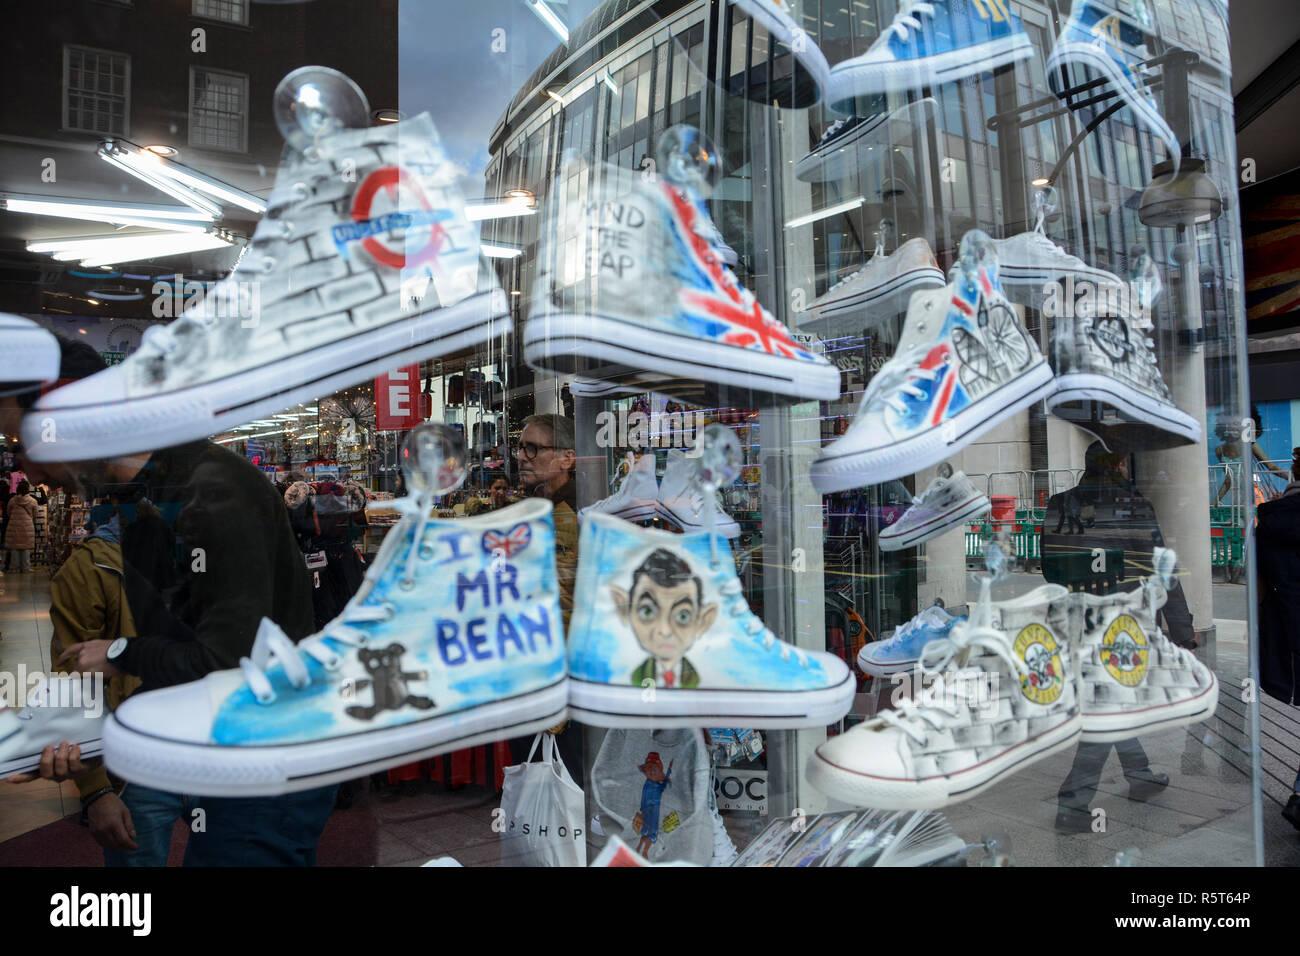 b380b514ef46 Mr Bean converse shoes in a shoe shop